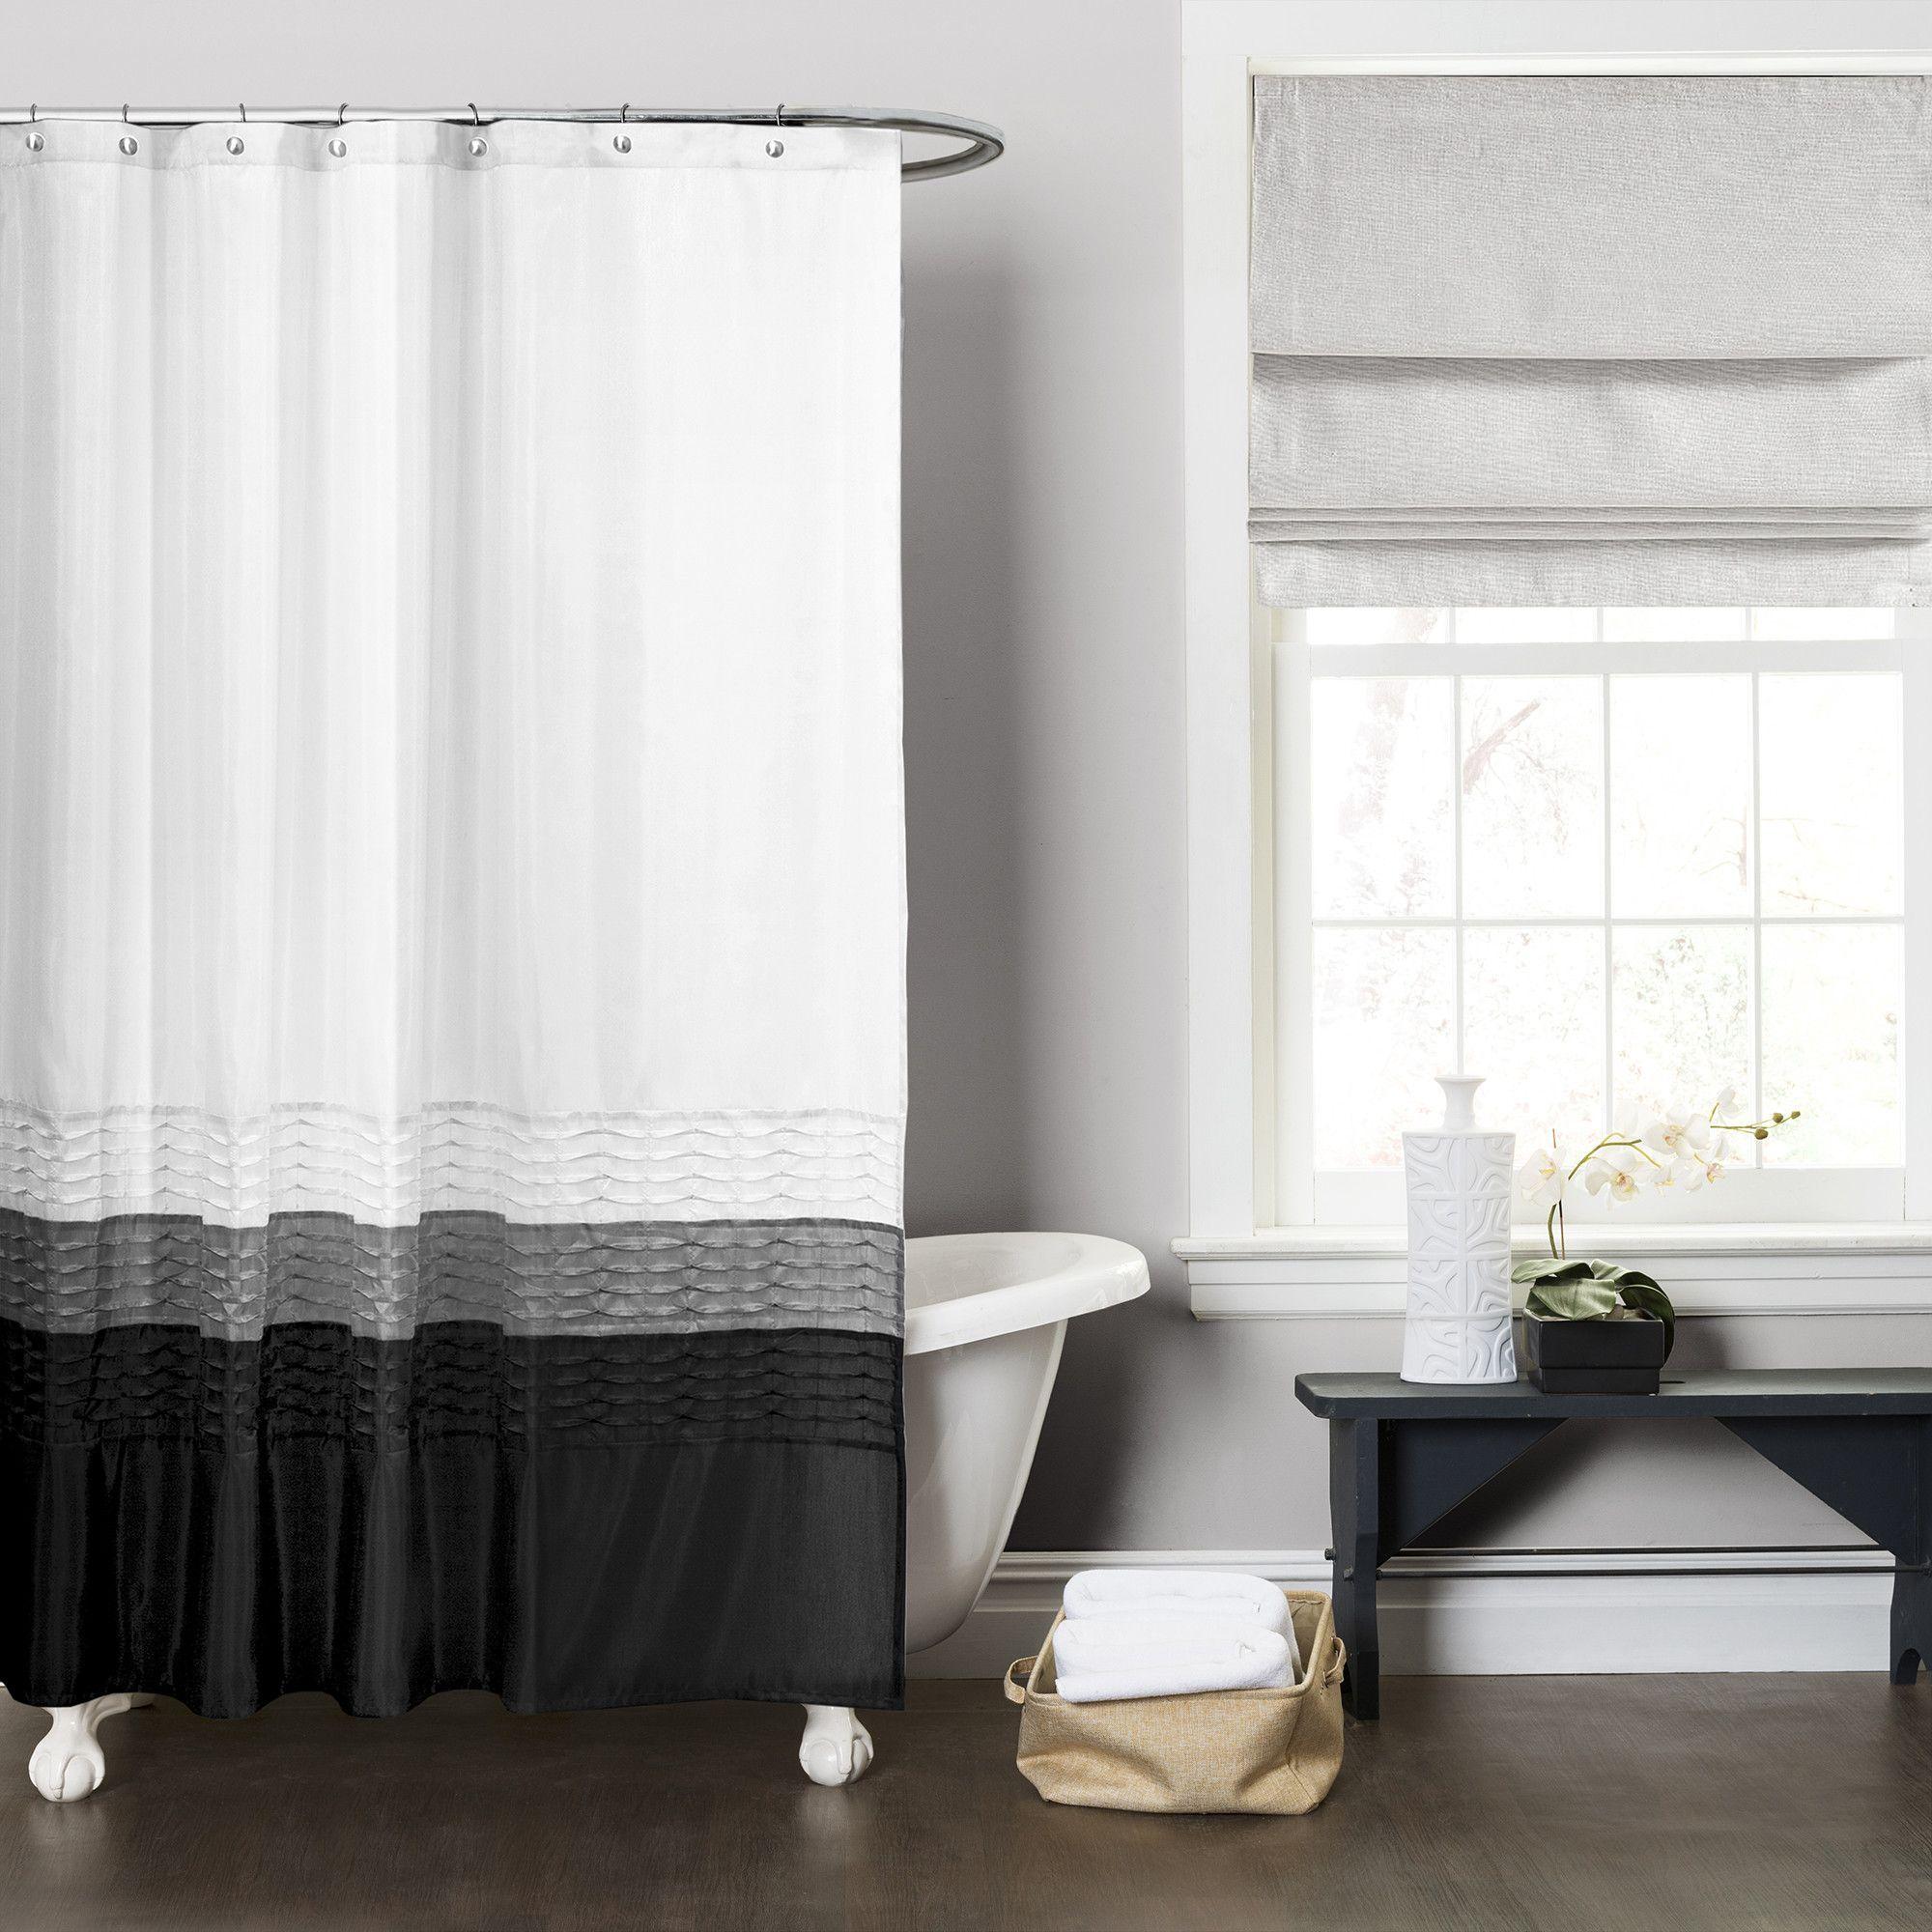 Elegant Shower Curtain mia shower curtain | elegant shower curtains